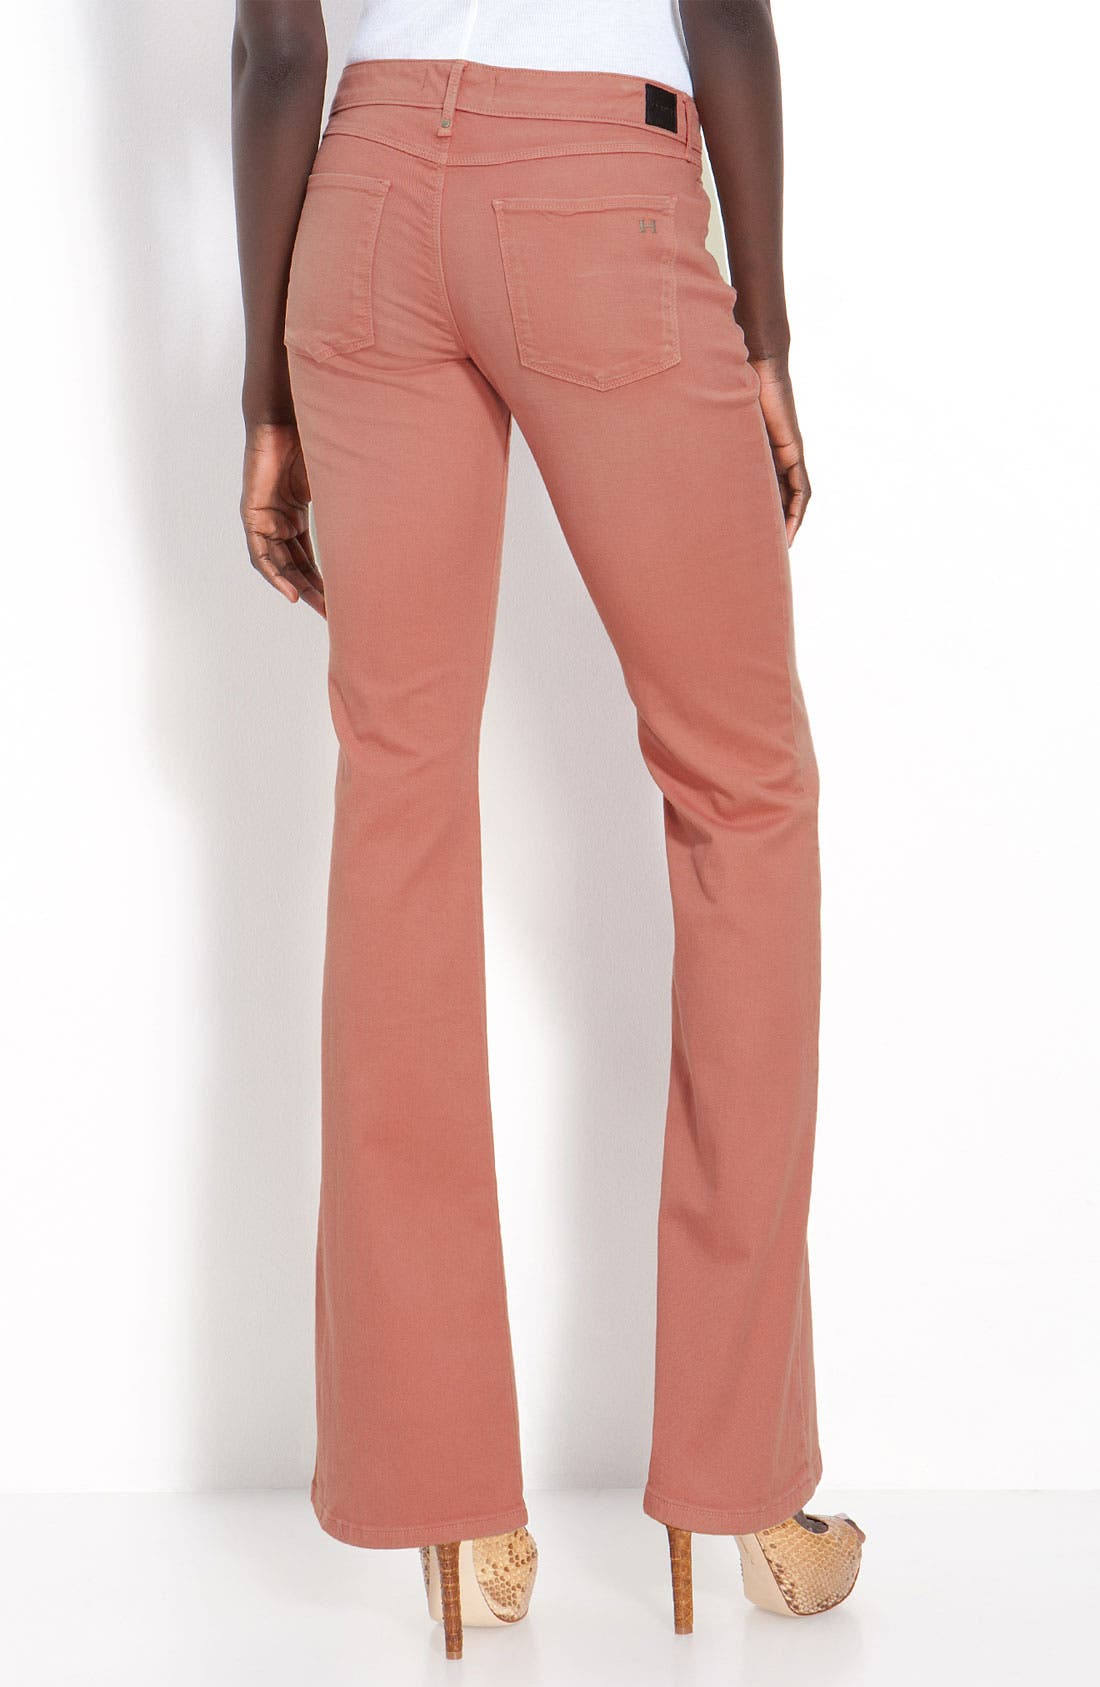 Alternate Image 1 Selected - Habitual 'Vintage Hayworth' Flare Leg Stretch Jeans